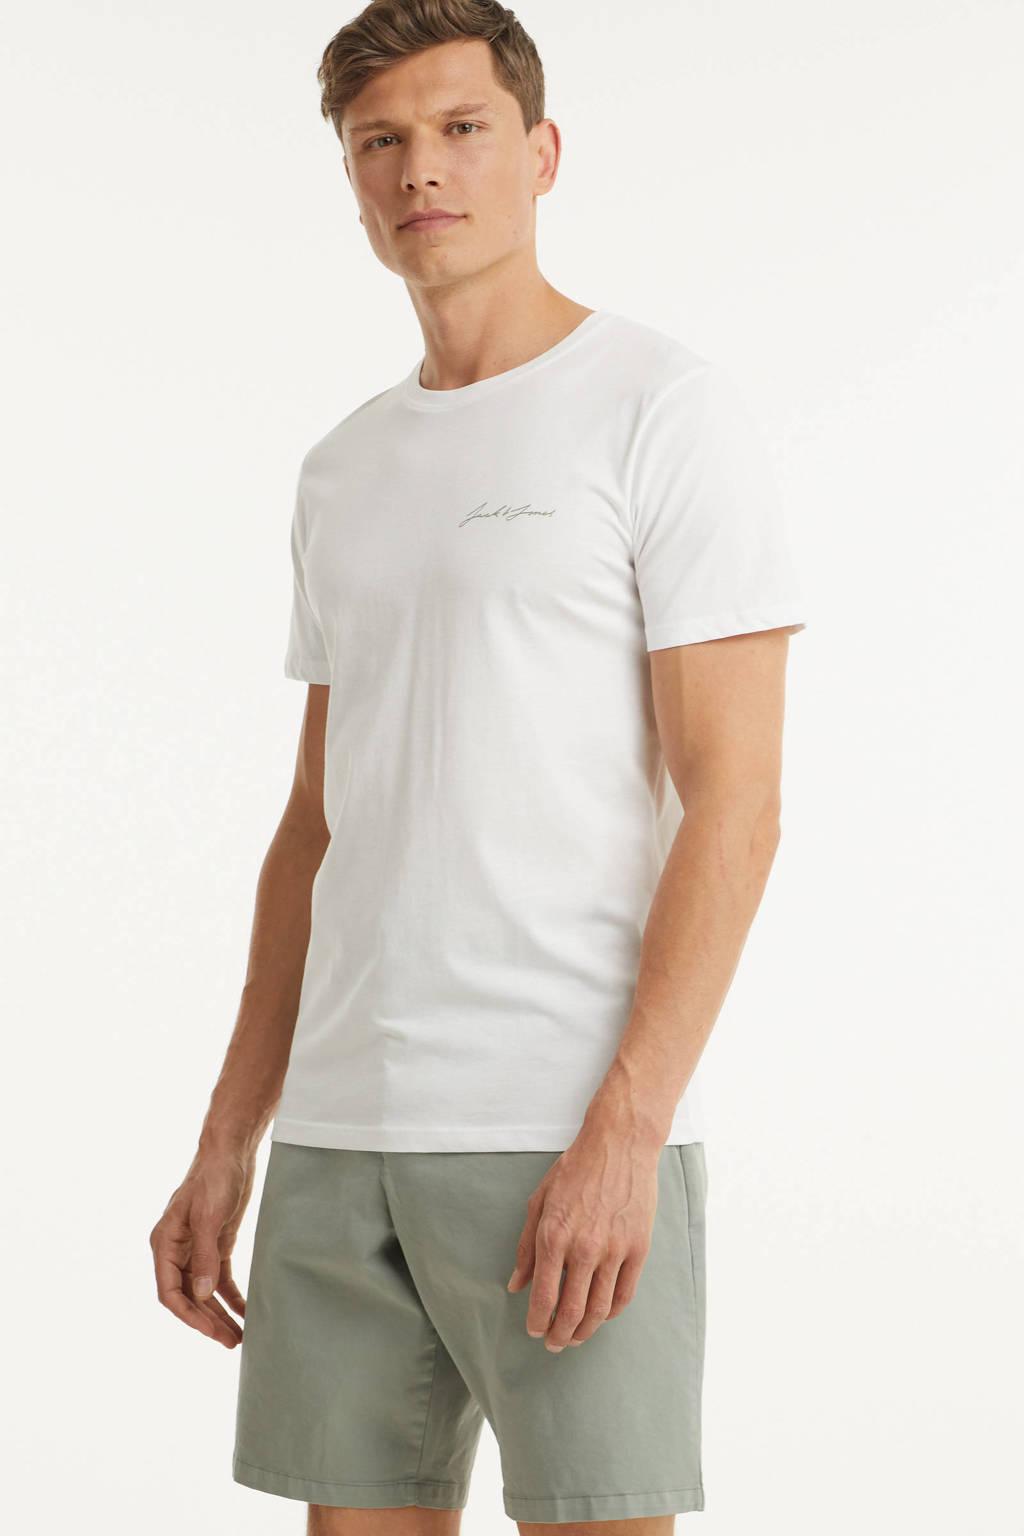 JACK & JONES ORIGINALS T-shirt wit, Wit